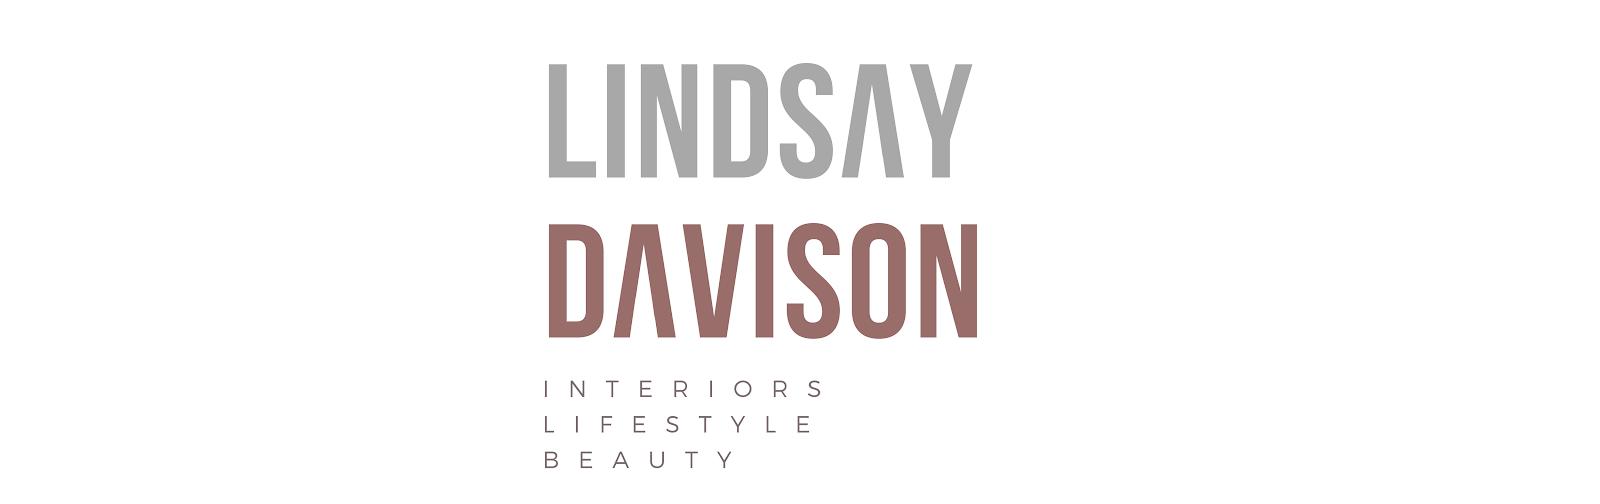 Lindsay Davison